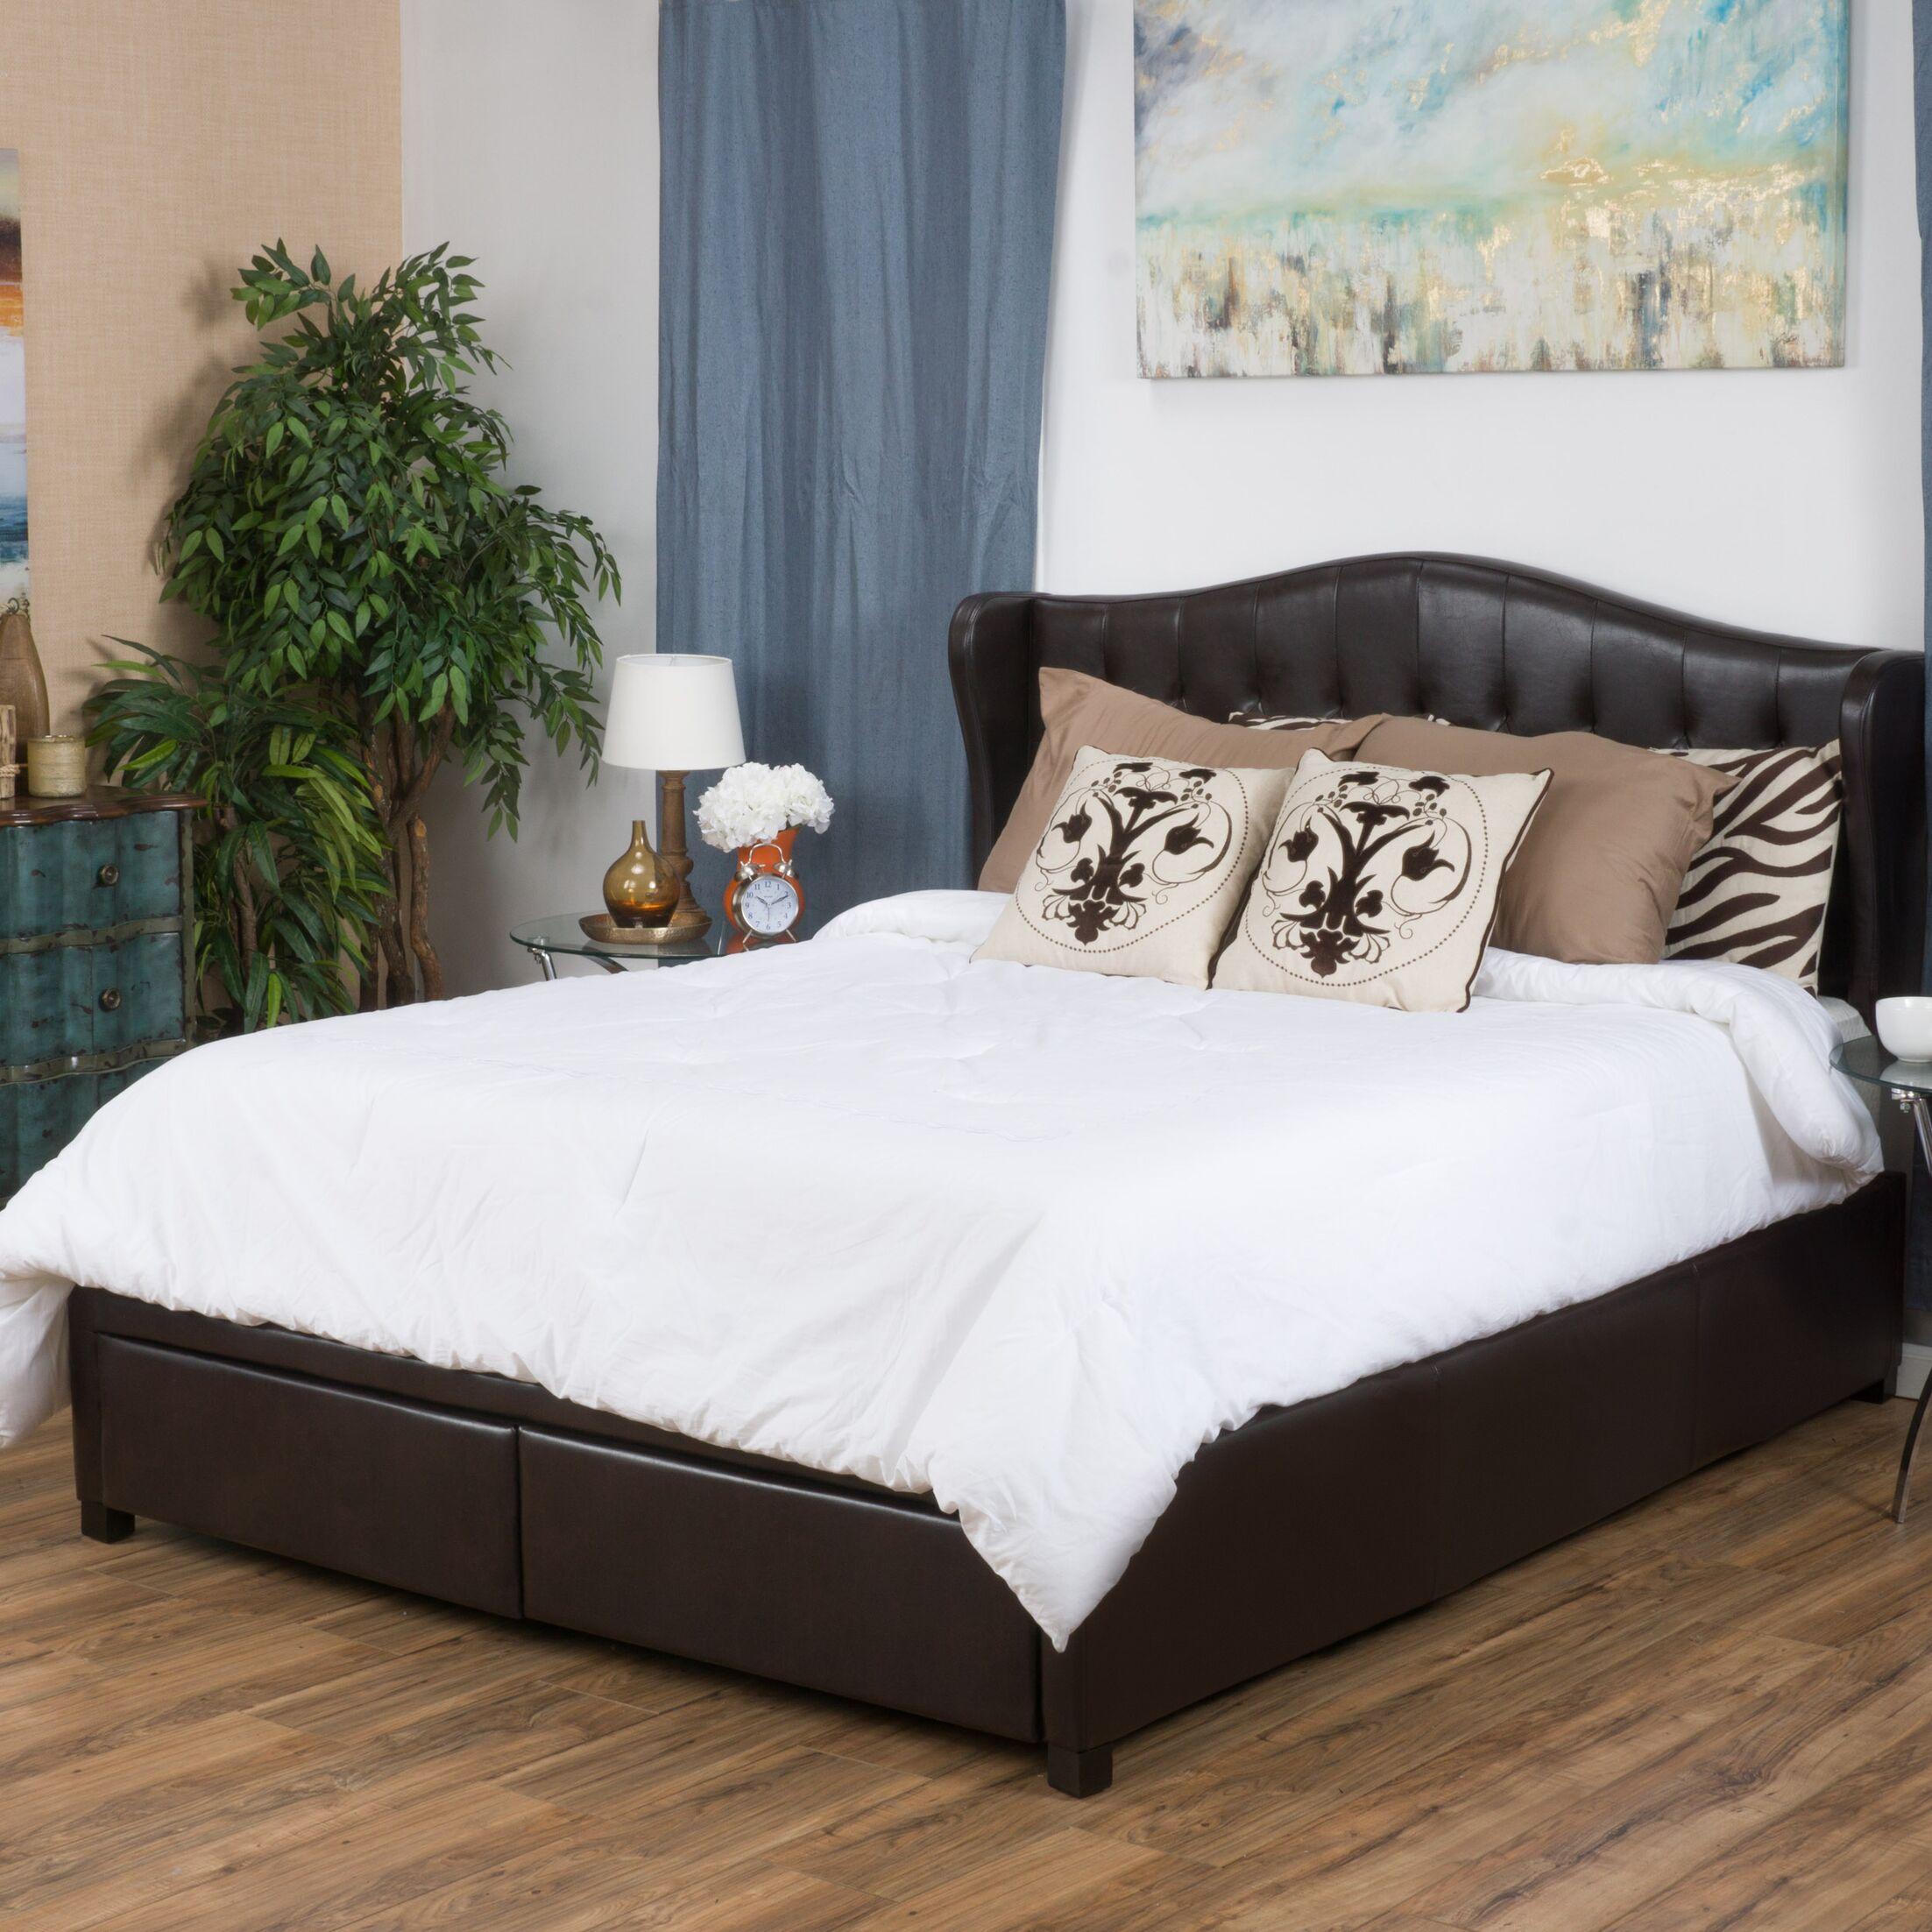 Riverside Upholstered Storage Panel Bed Size: Full